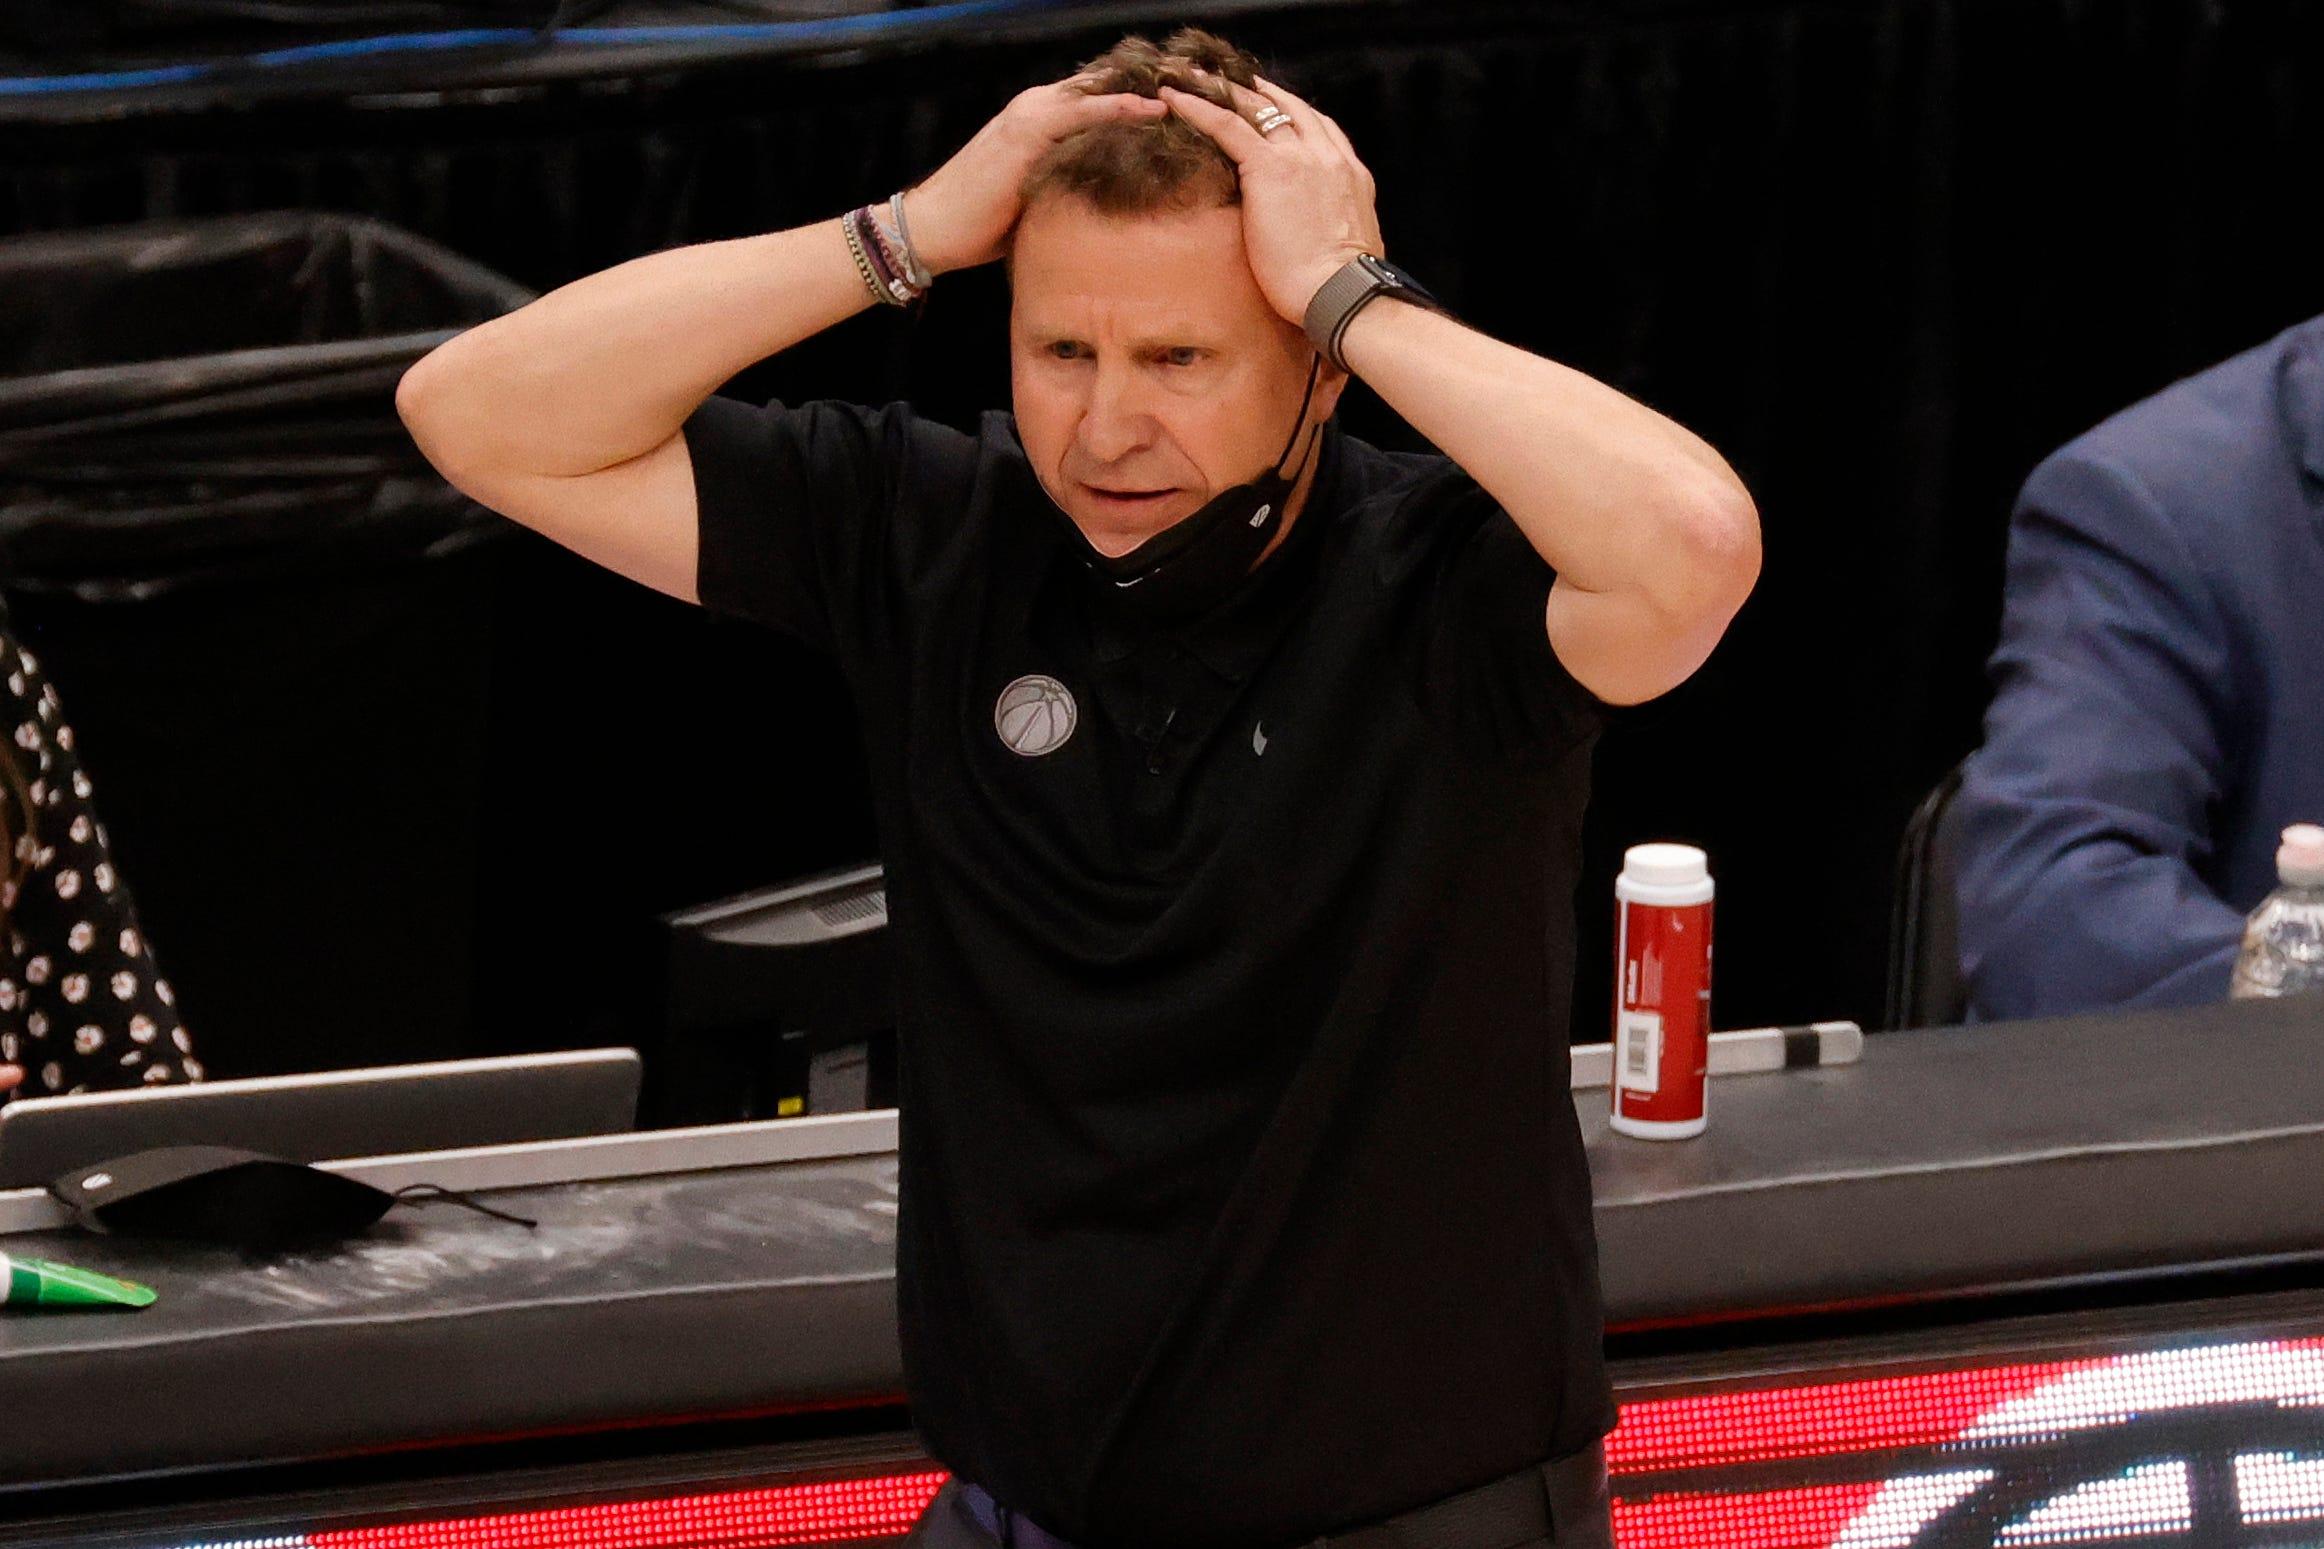 Washington Wizards part ways with coach Scott Brooks after five seasons